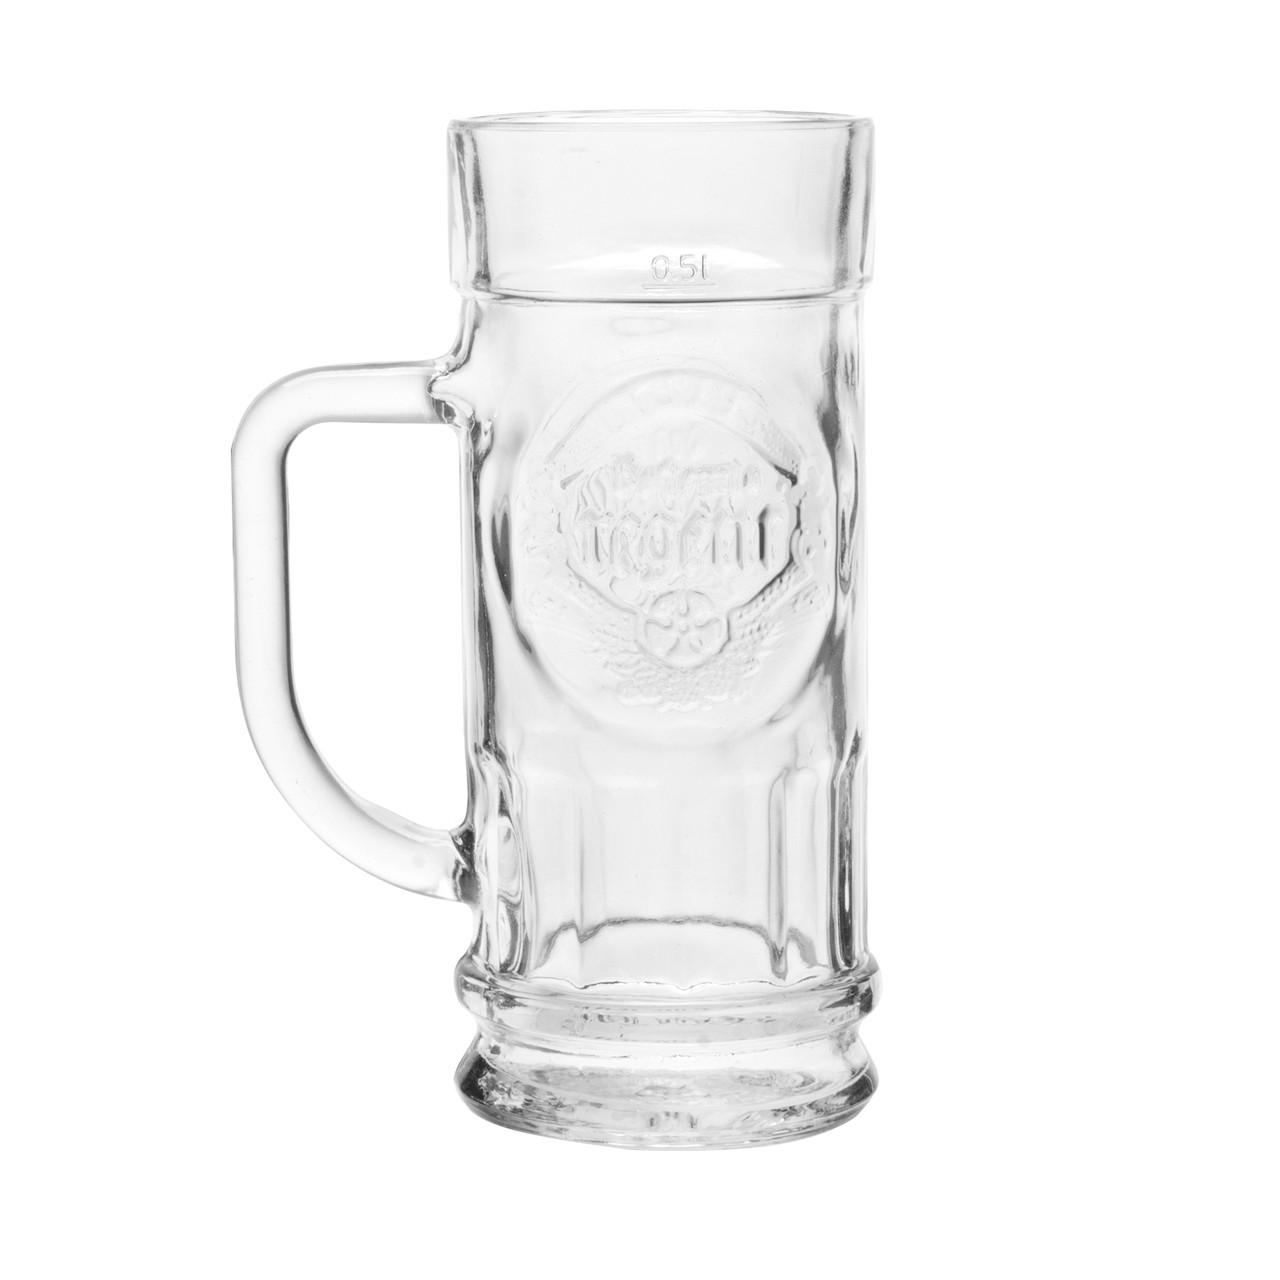 Кружка для пива РЕГЕНТ 500мл.